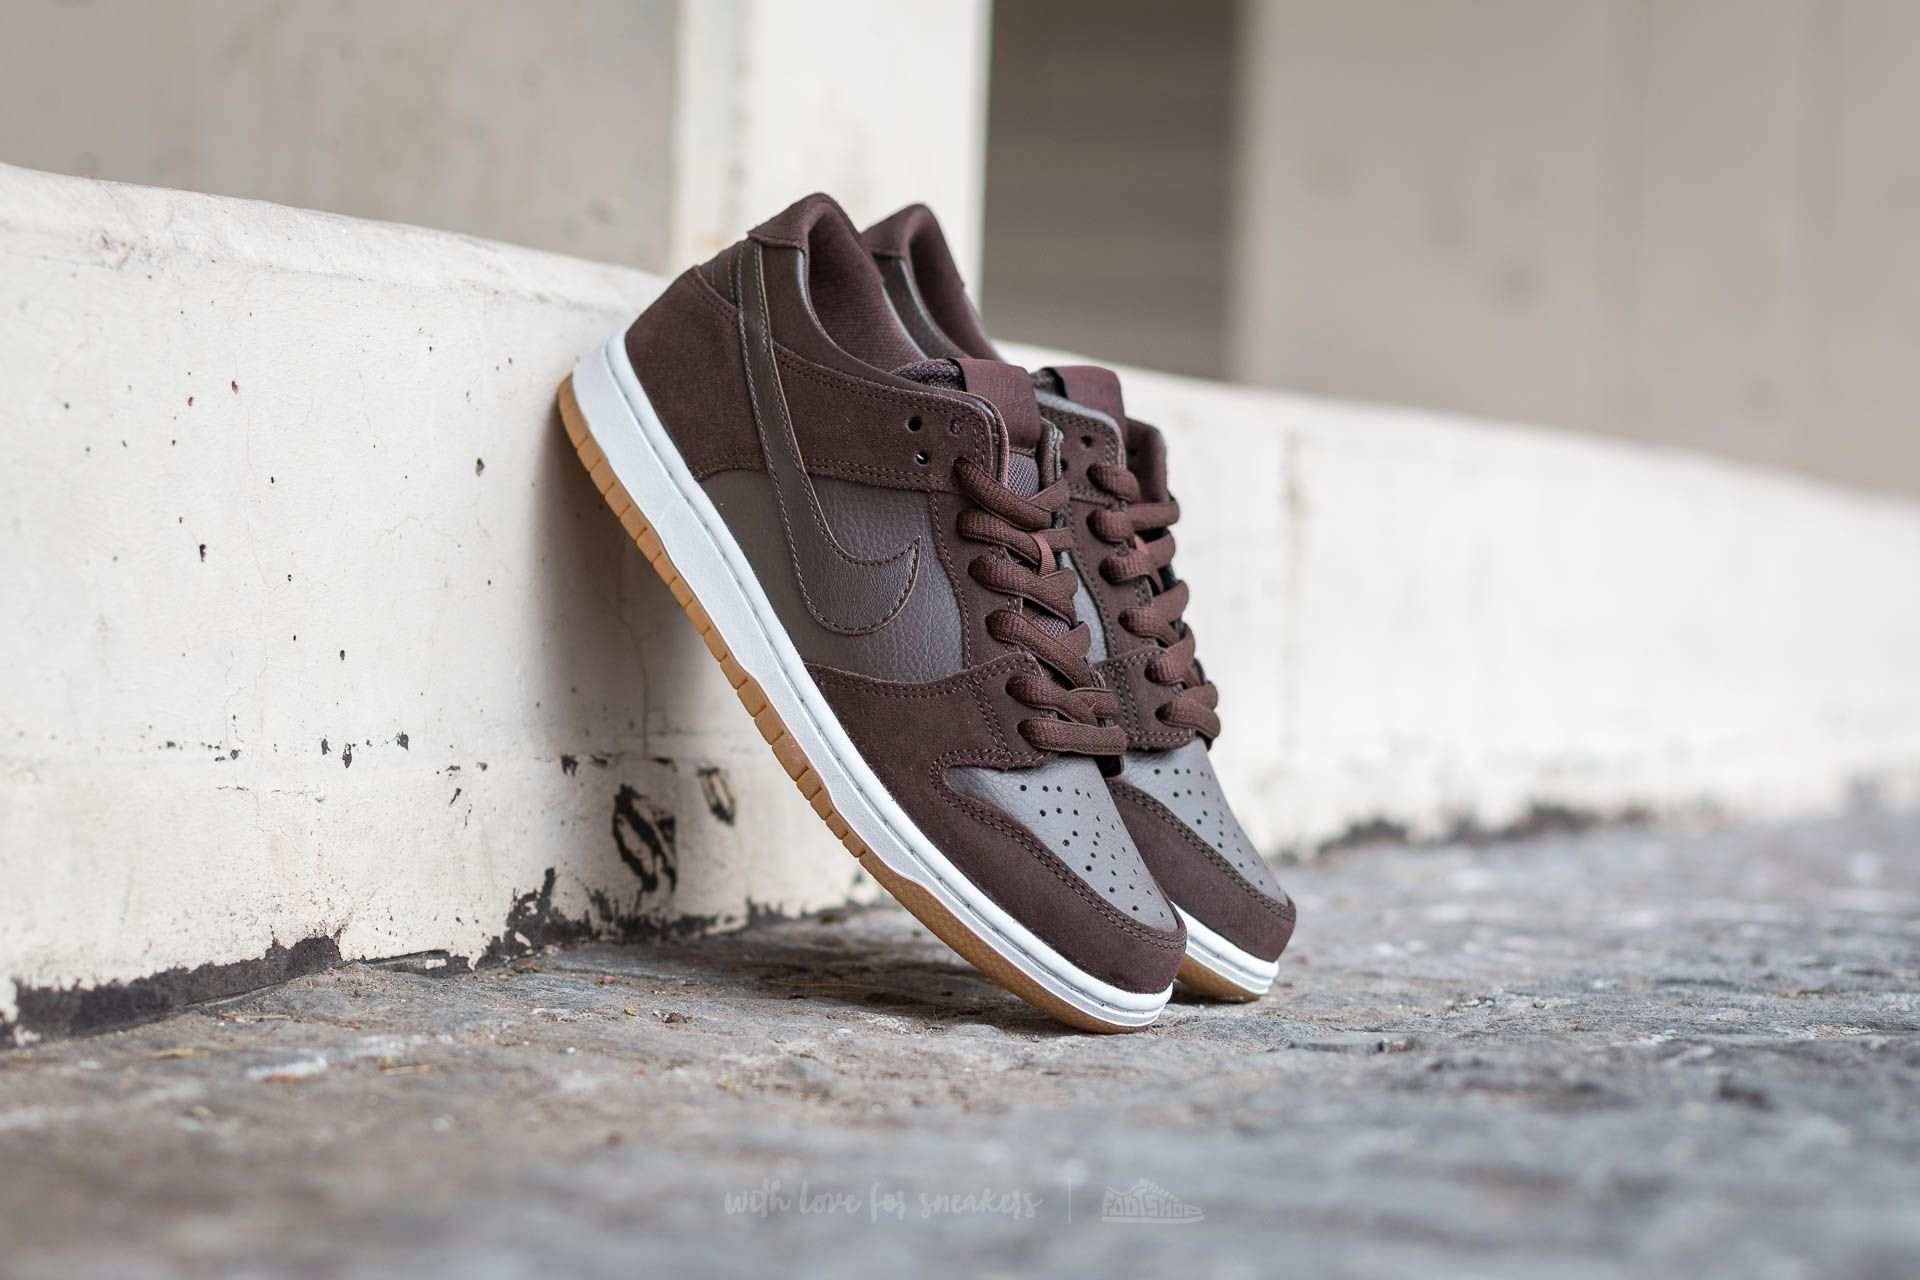 Nike Dunk Low Pro Ishod Wair Baroque Brown/ Baroque Brown-White